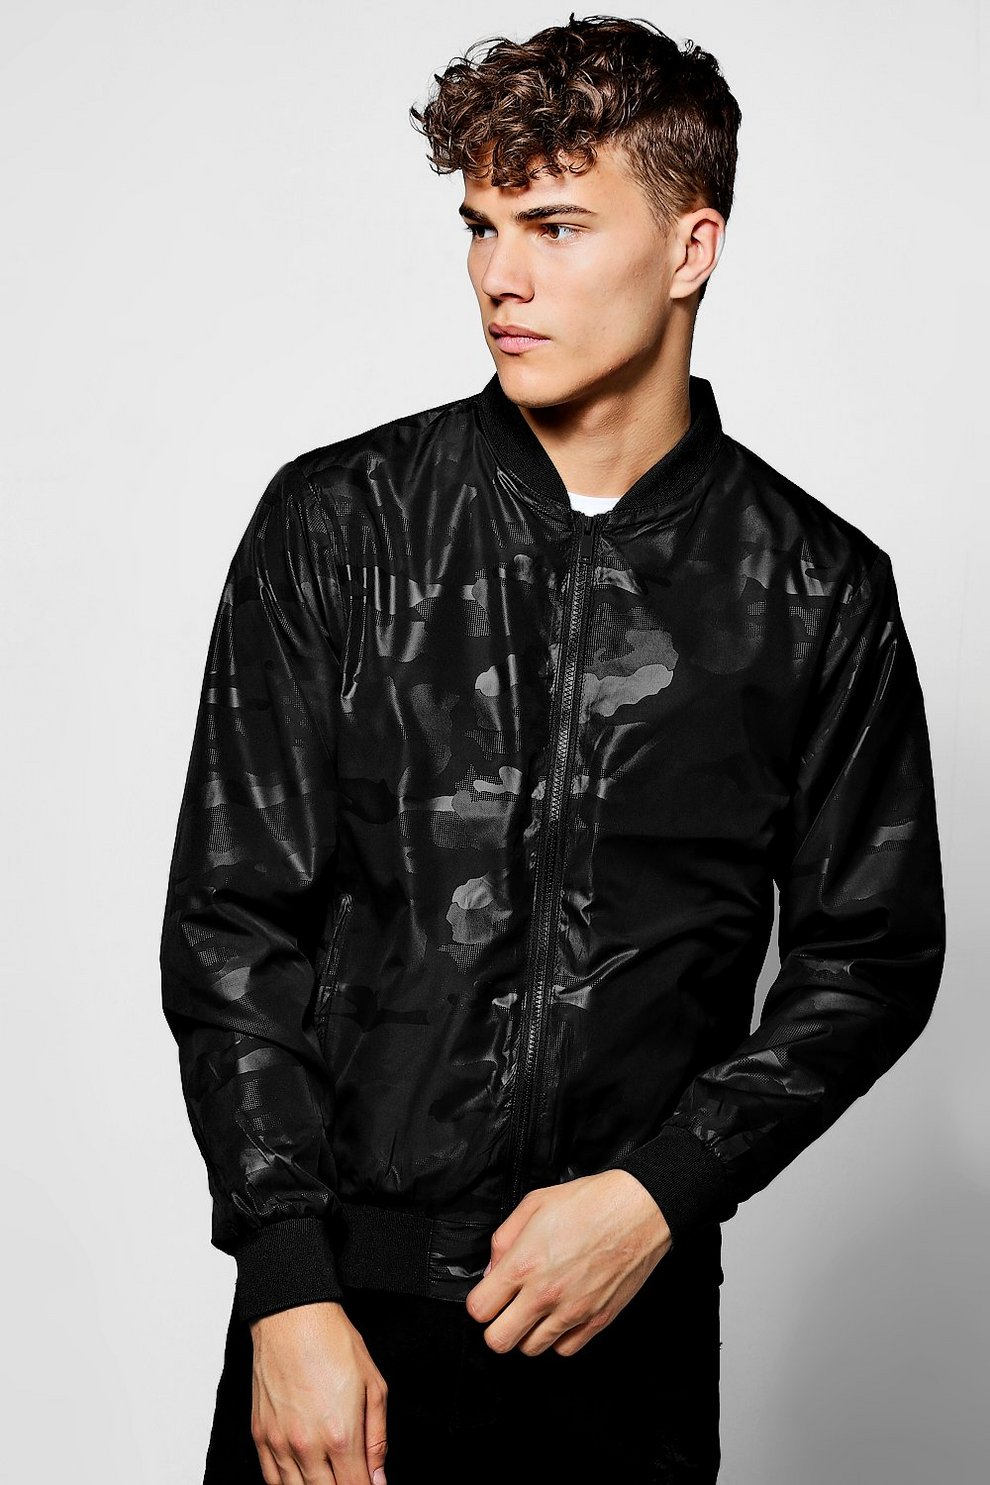 Free Shipping Pick A Best New Fashion Style Of Boohoo Camo Bomber Jacket RrtEsCiB9